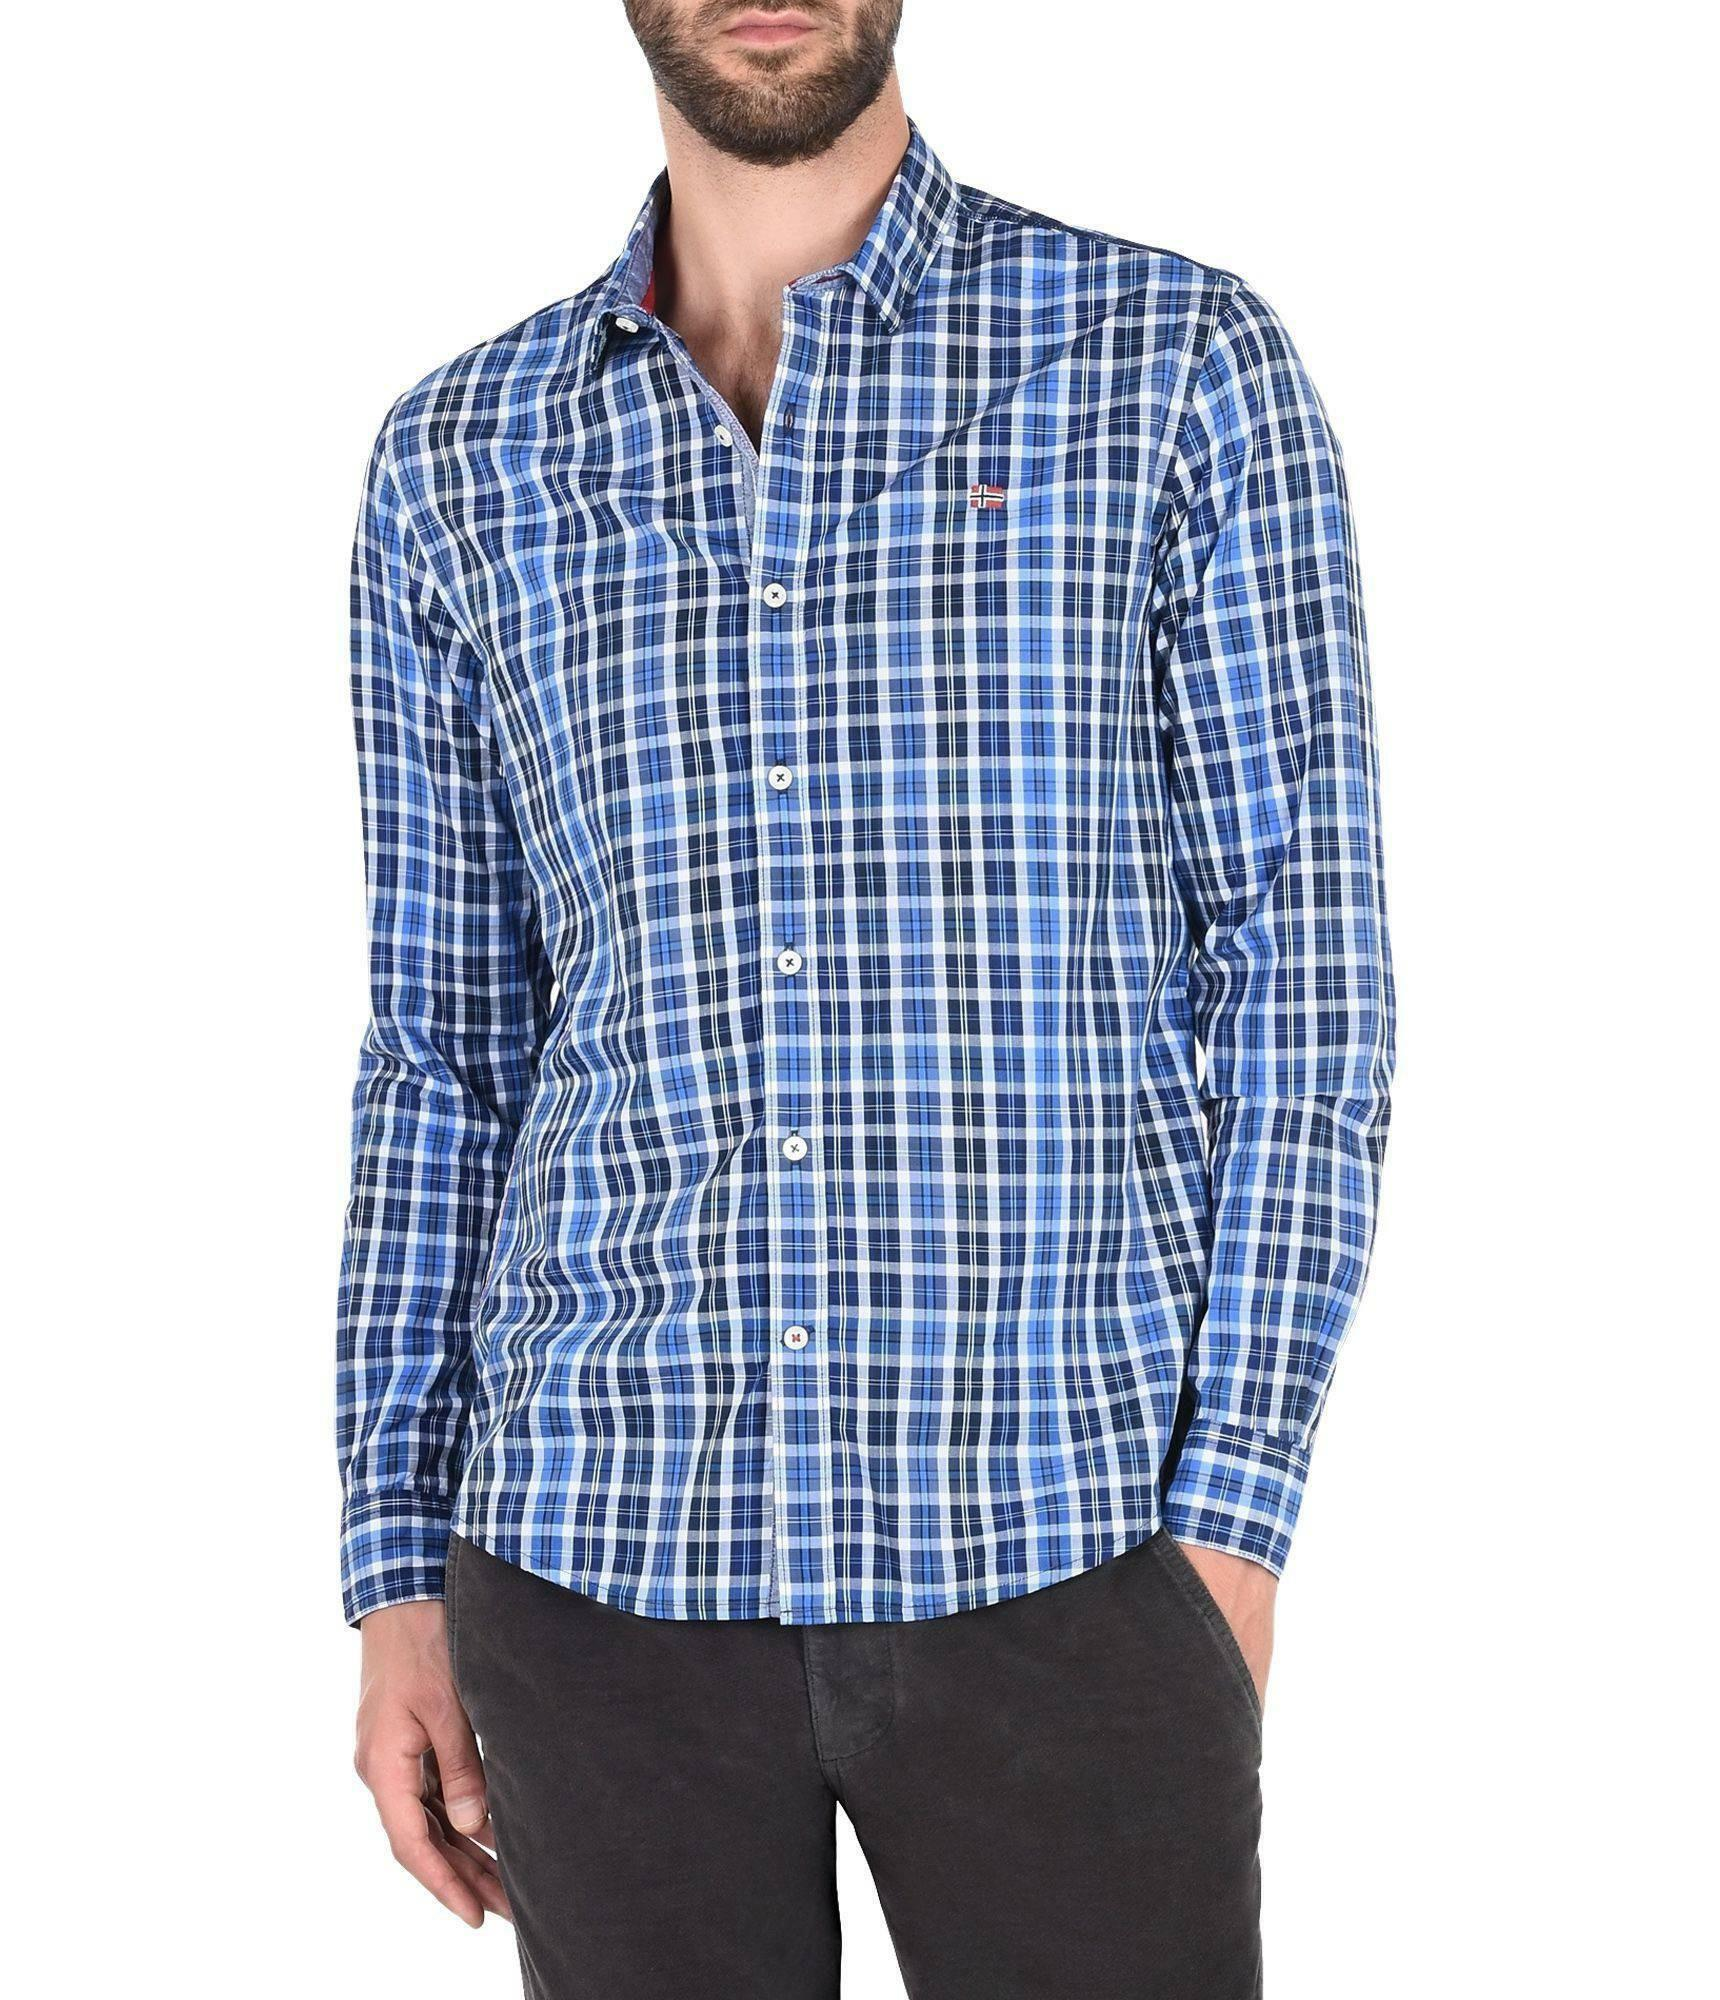 napapijri napapijri glockner camicia uomo a quadretti blu